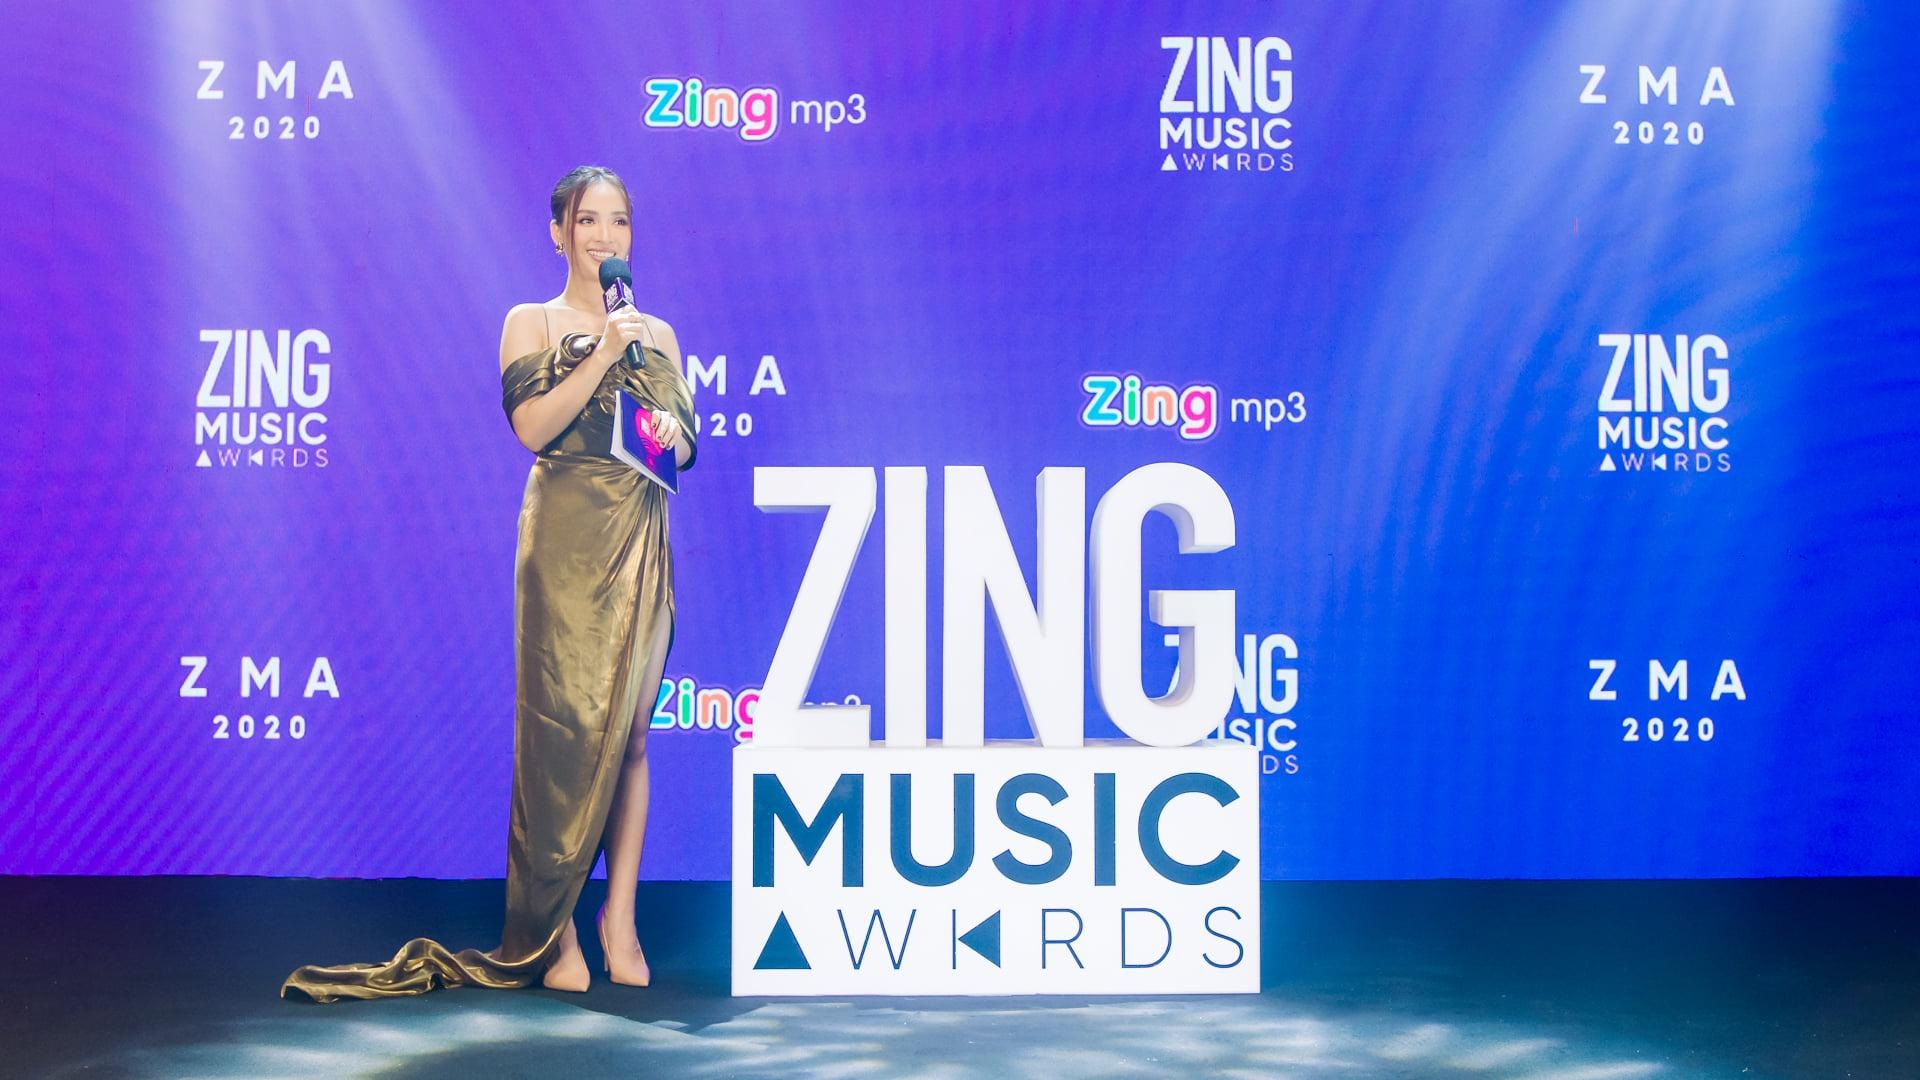 cong bo ket qua Zing Music Awards 2020 anh 4